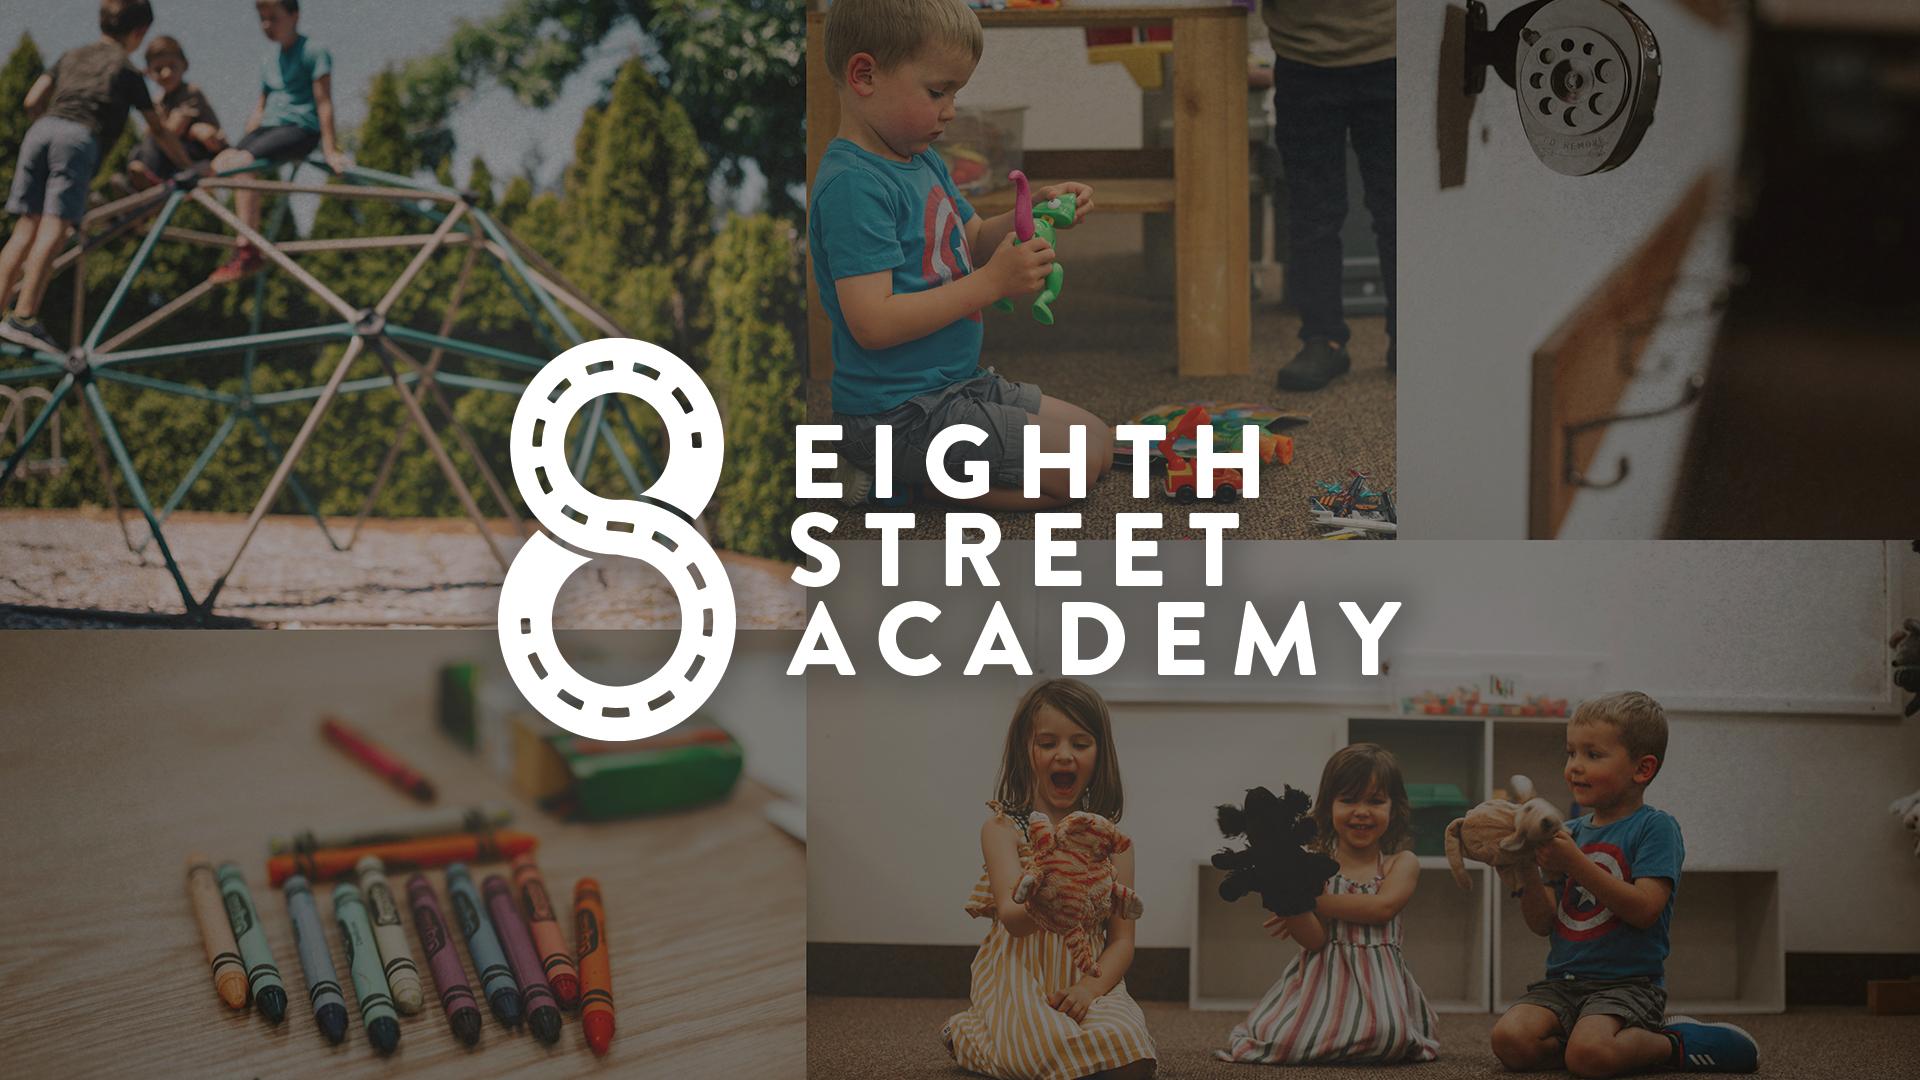 8th Street Academy